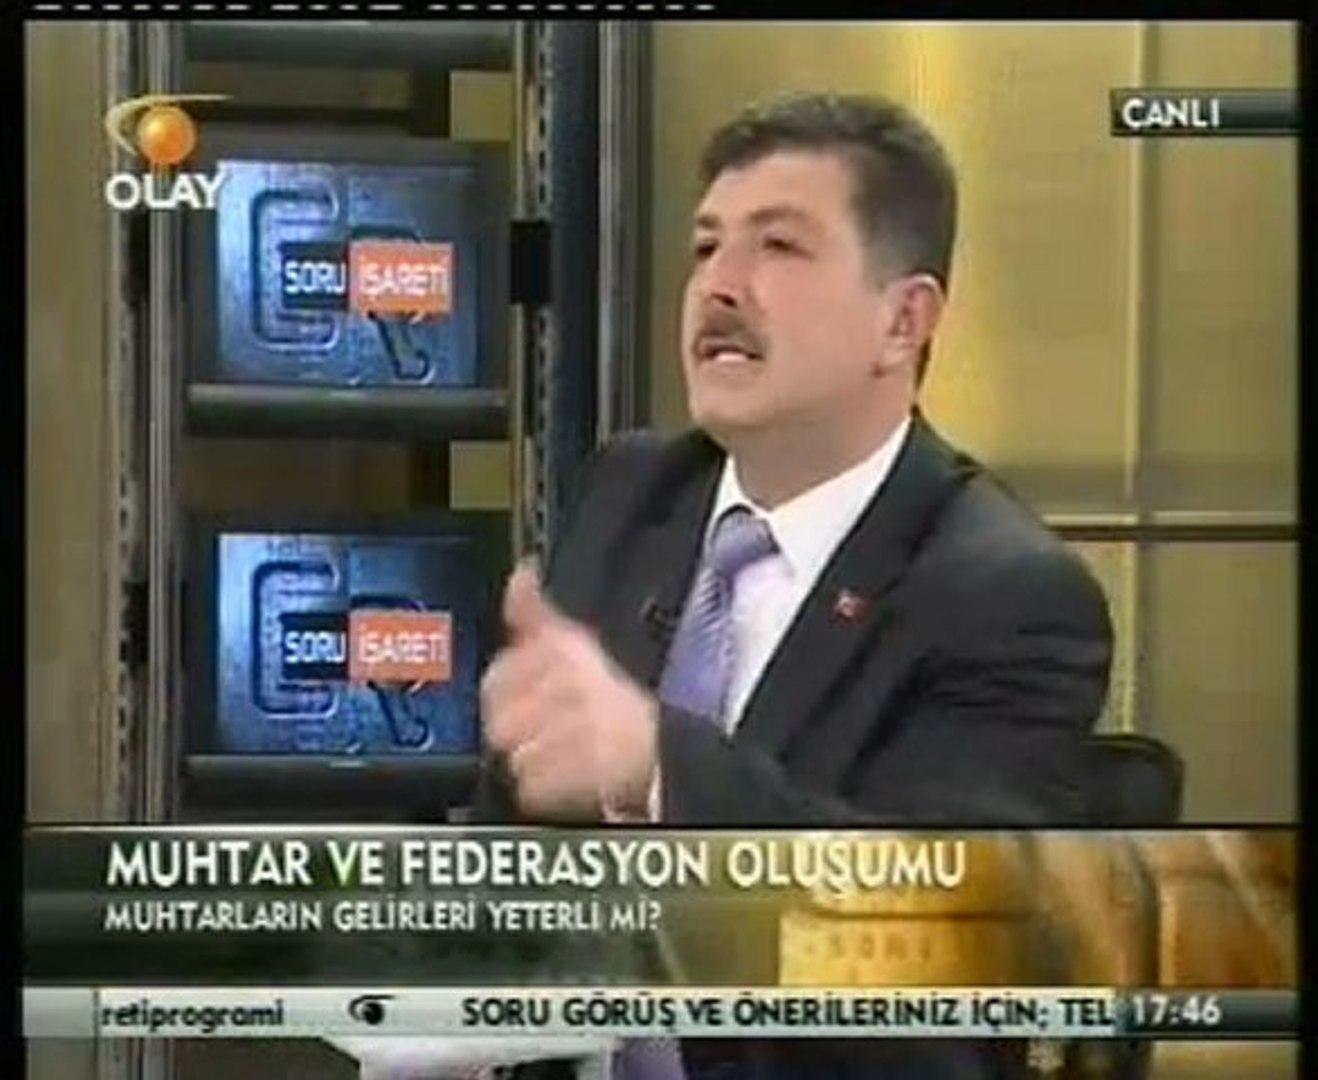 OLAY TV HUSEYİN AKDENİZ CANLI YAYIN 08 OCAK 2012.mpg